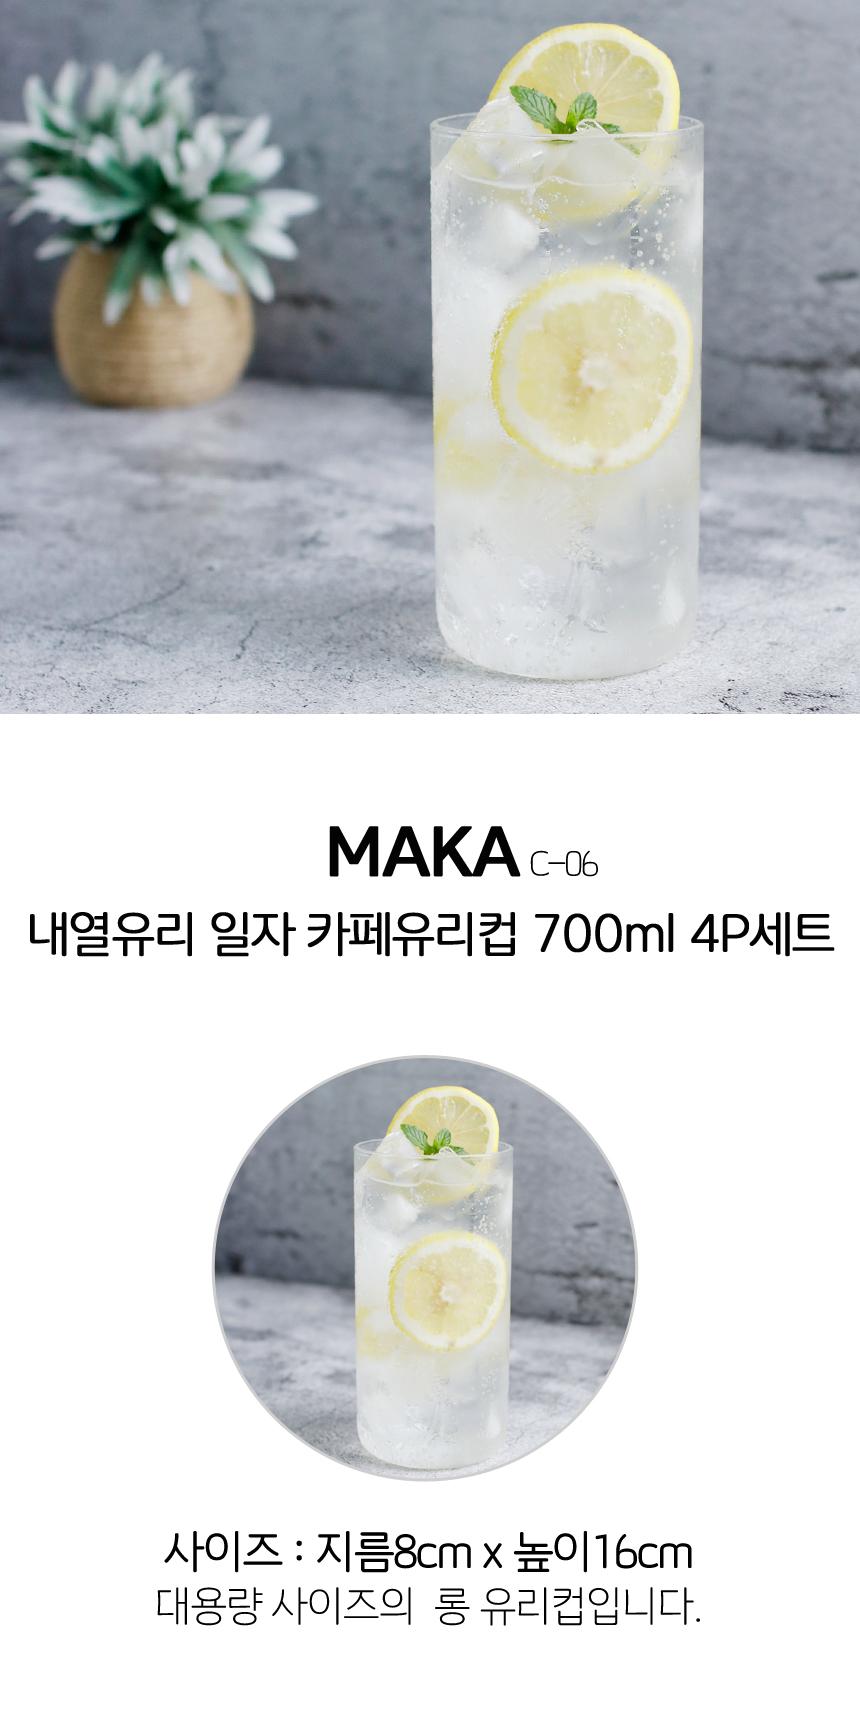 MAKA 내열유리 카페유리컵 700ml 4P세트(C06) - 김씨하우스, 25,000원, 유리컵/술잔, 유리컵